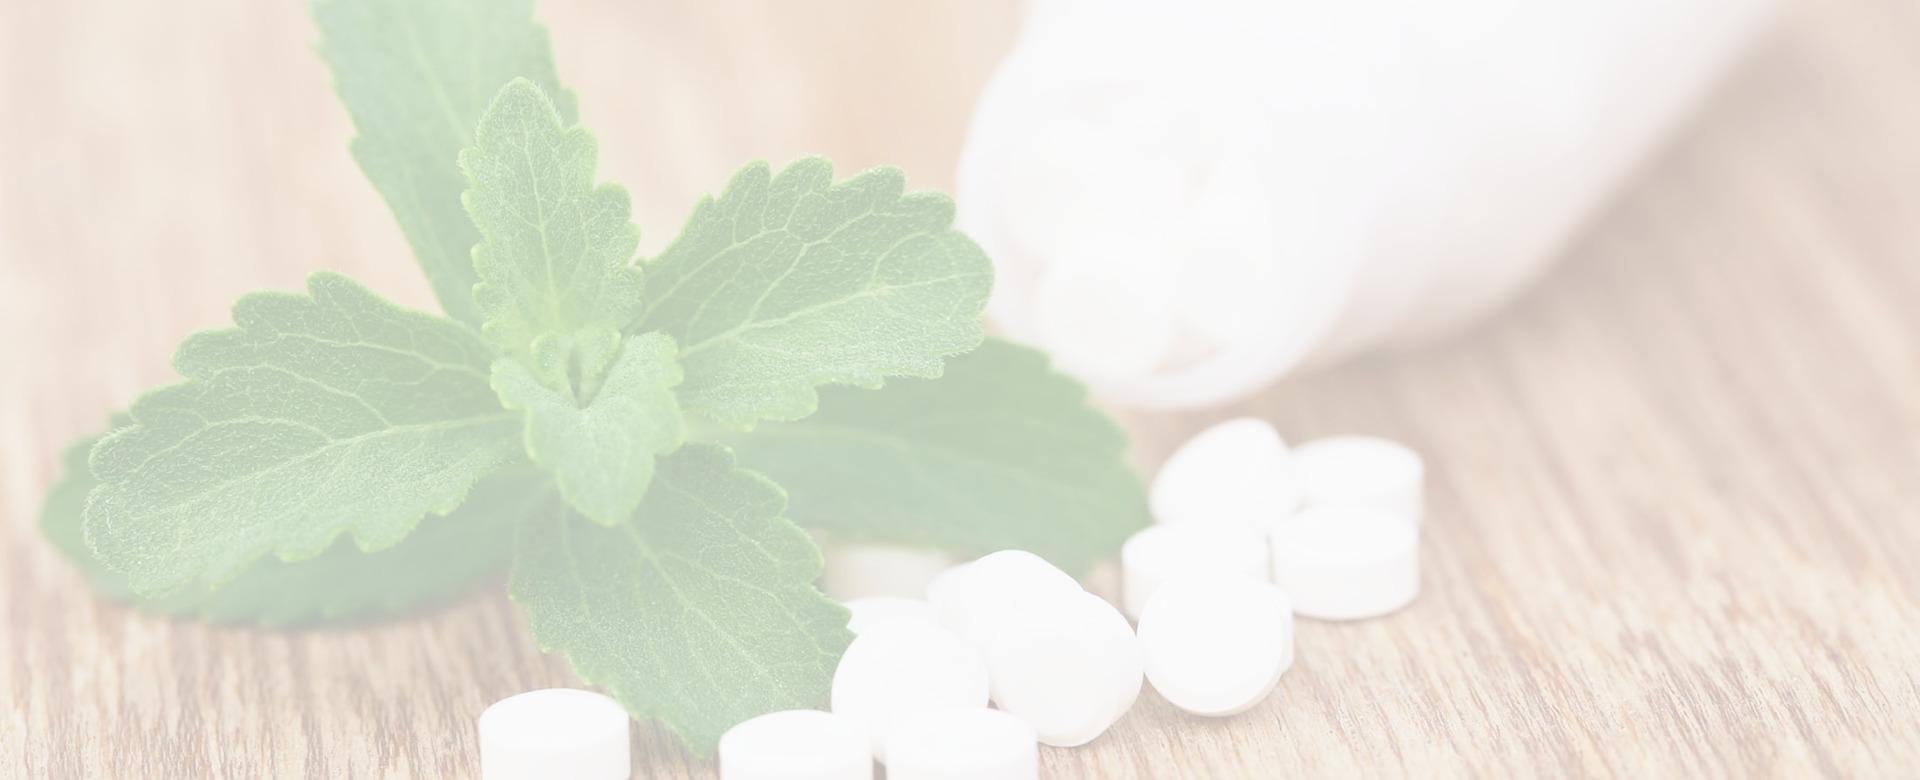 naturopatia-farmacia-torino